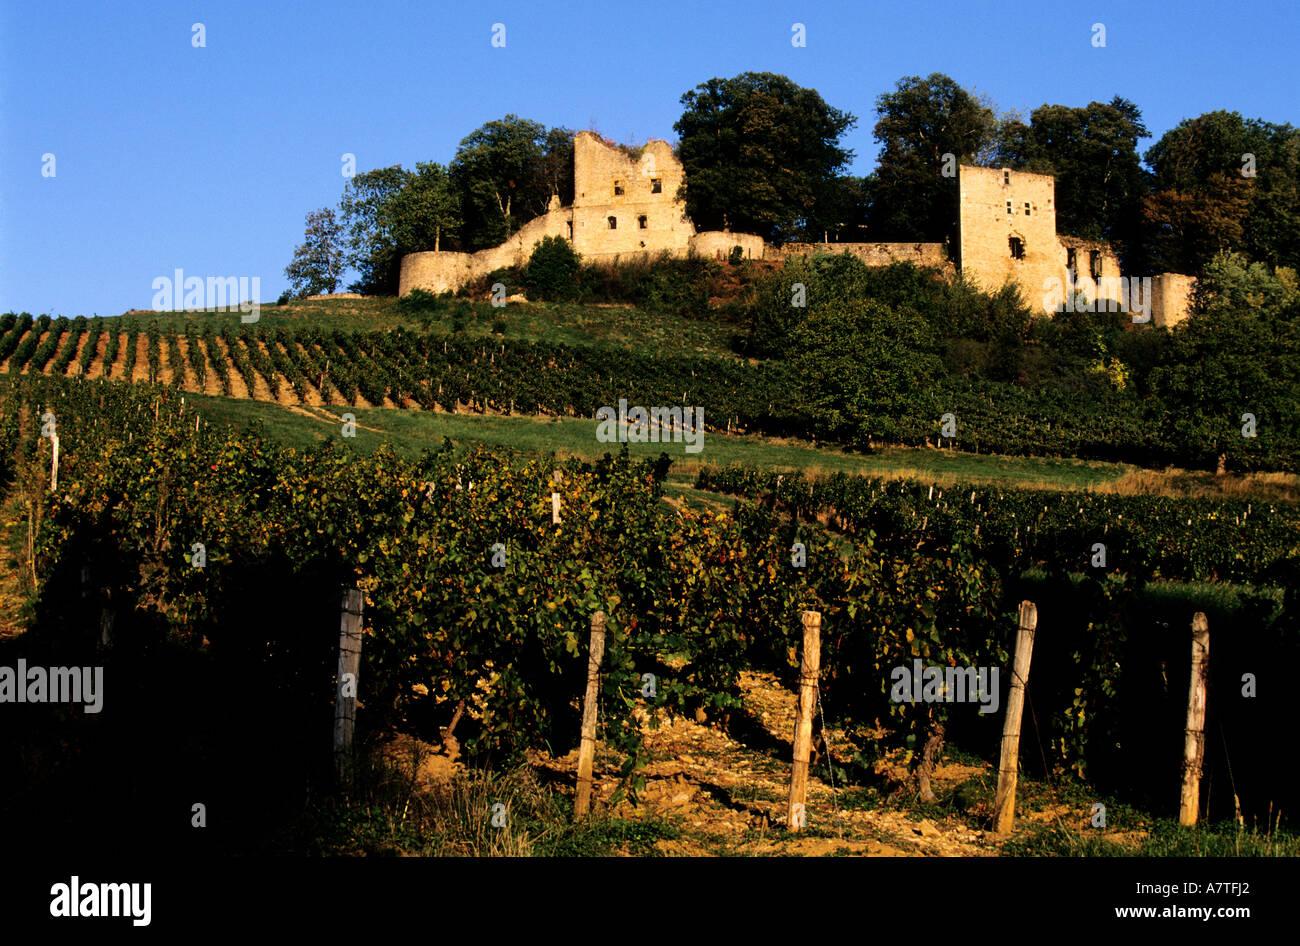 France Jura Arlay Castle Stock Photo Alamy